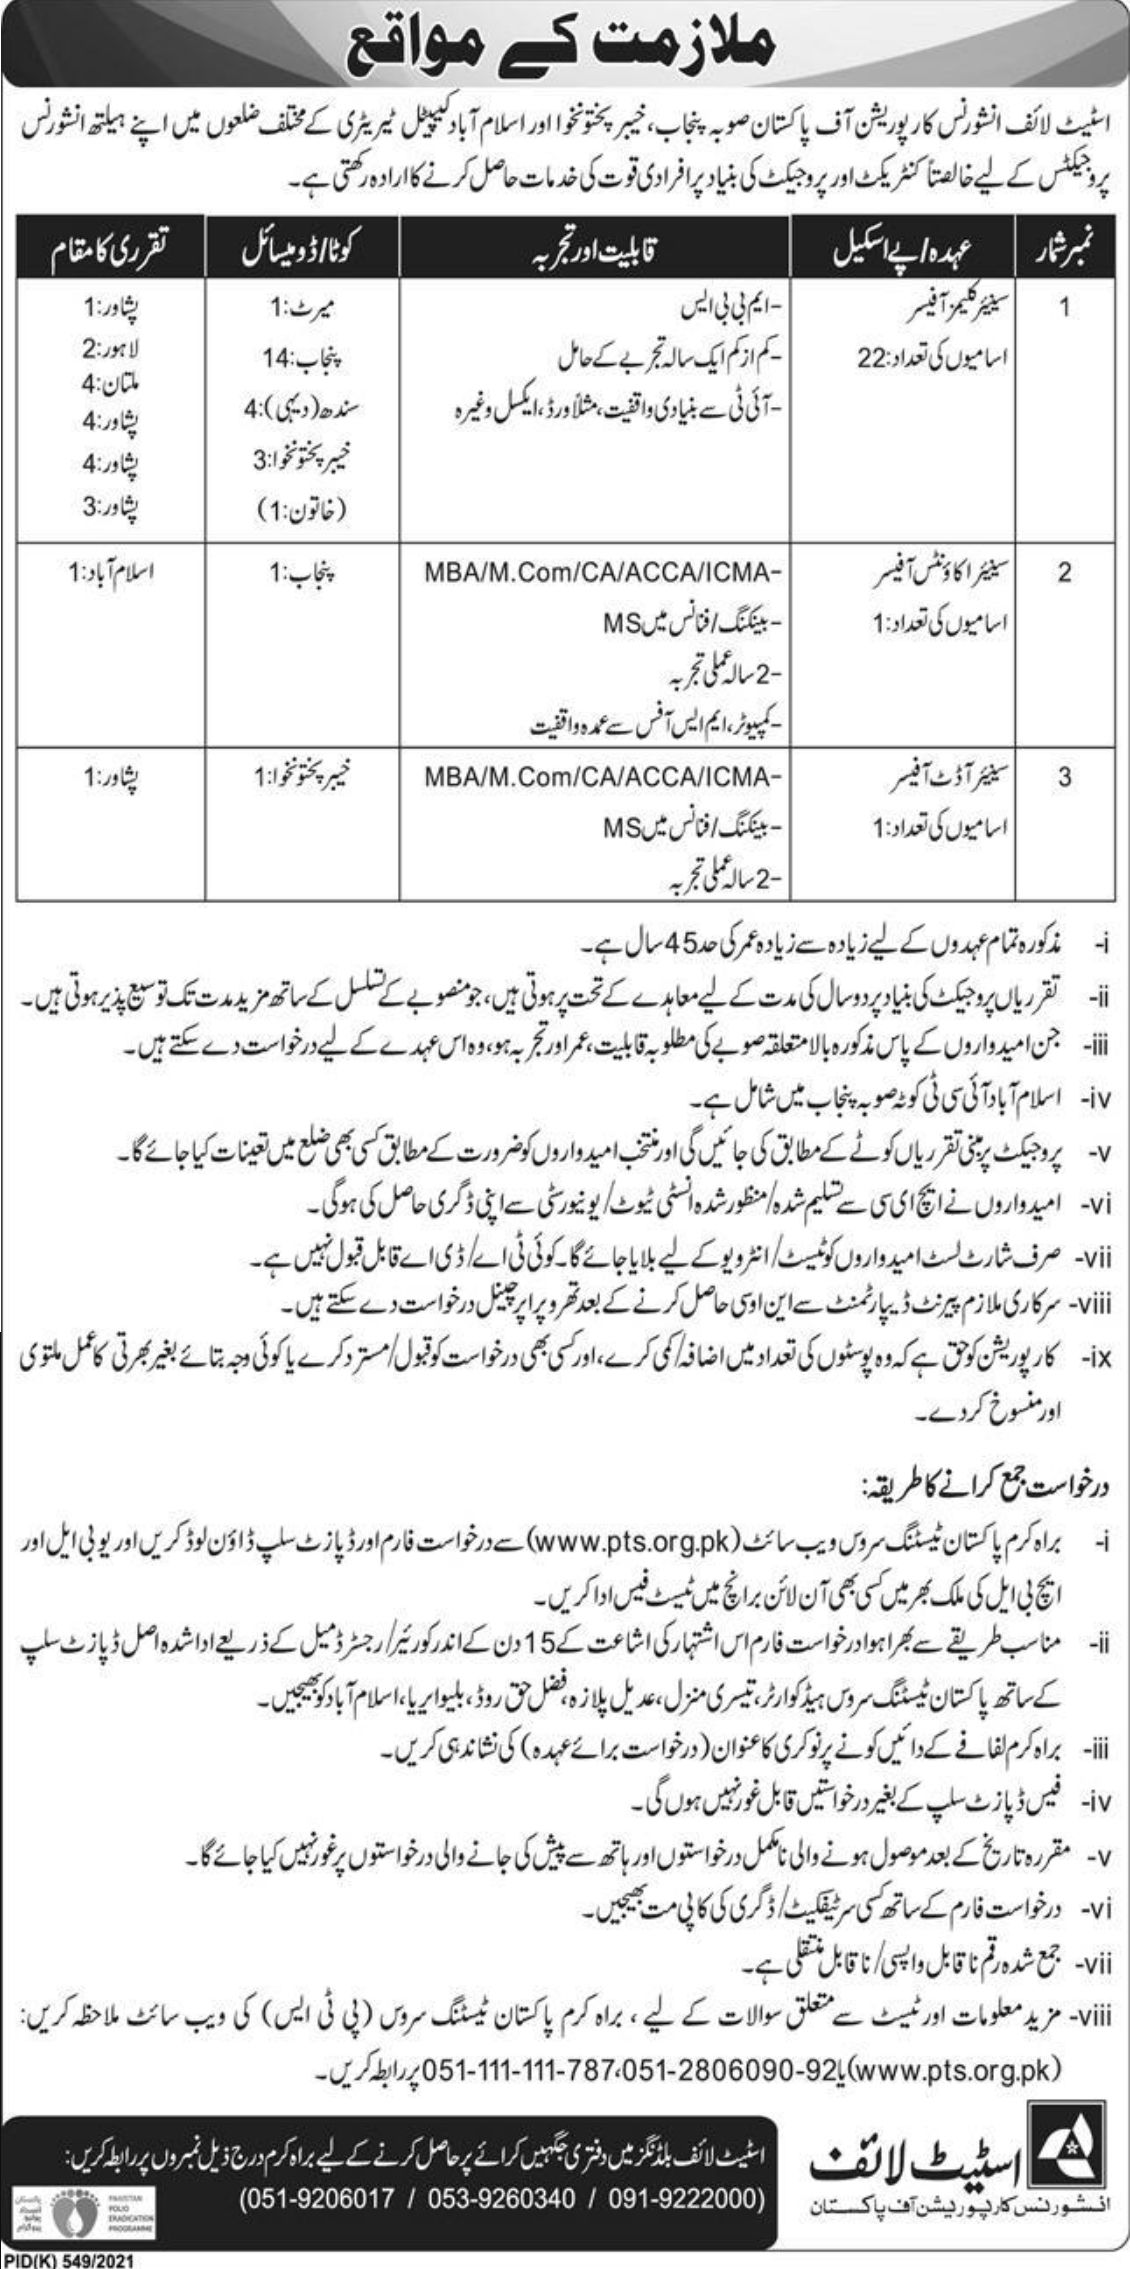 State Life Insurance Corporation of Pakistan Vacancies 2021 3